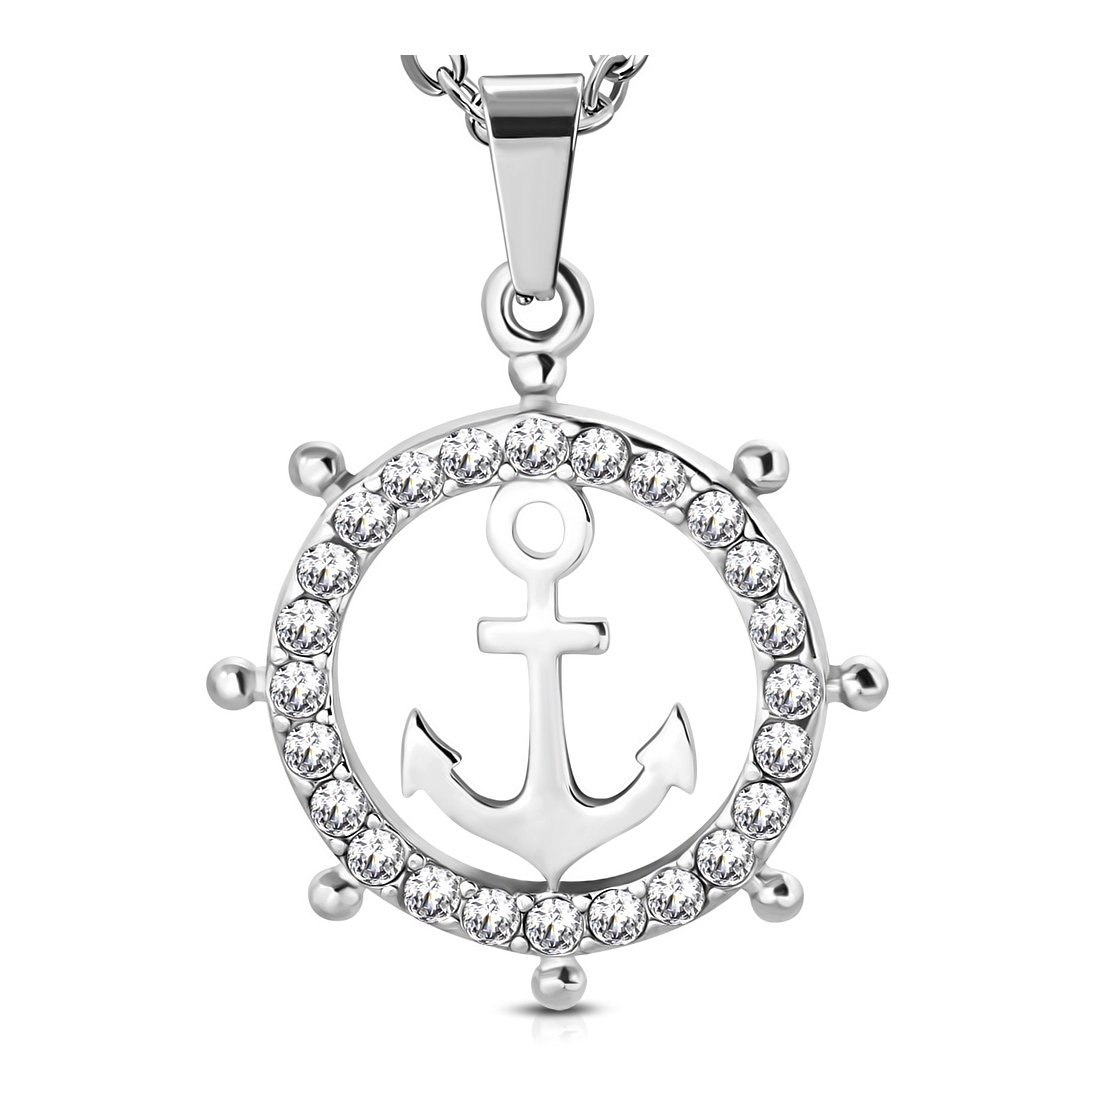 Acier inoxydable Ancre Marine gouvernail Roue de bateau marin Charm pendentif avec Clear CZ NRG 316L Jewelry 205-QLI201